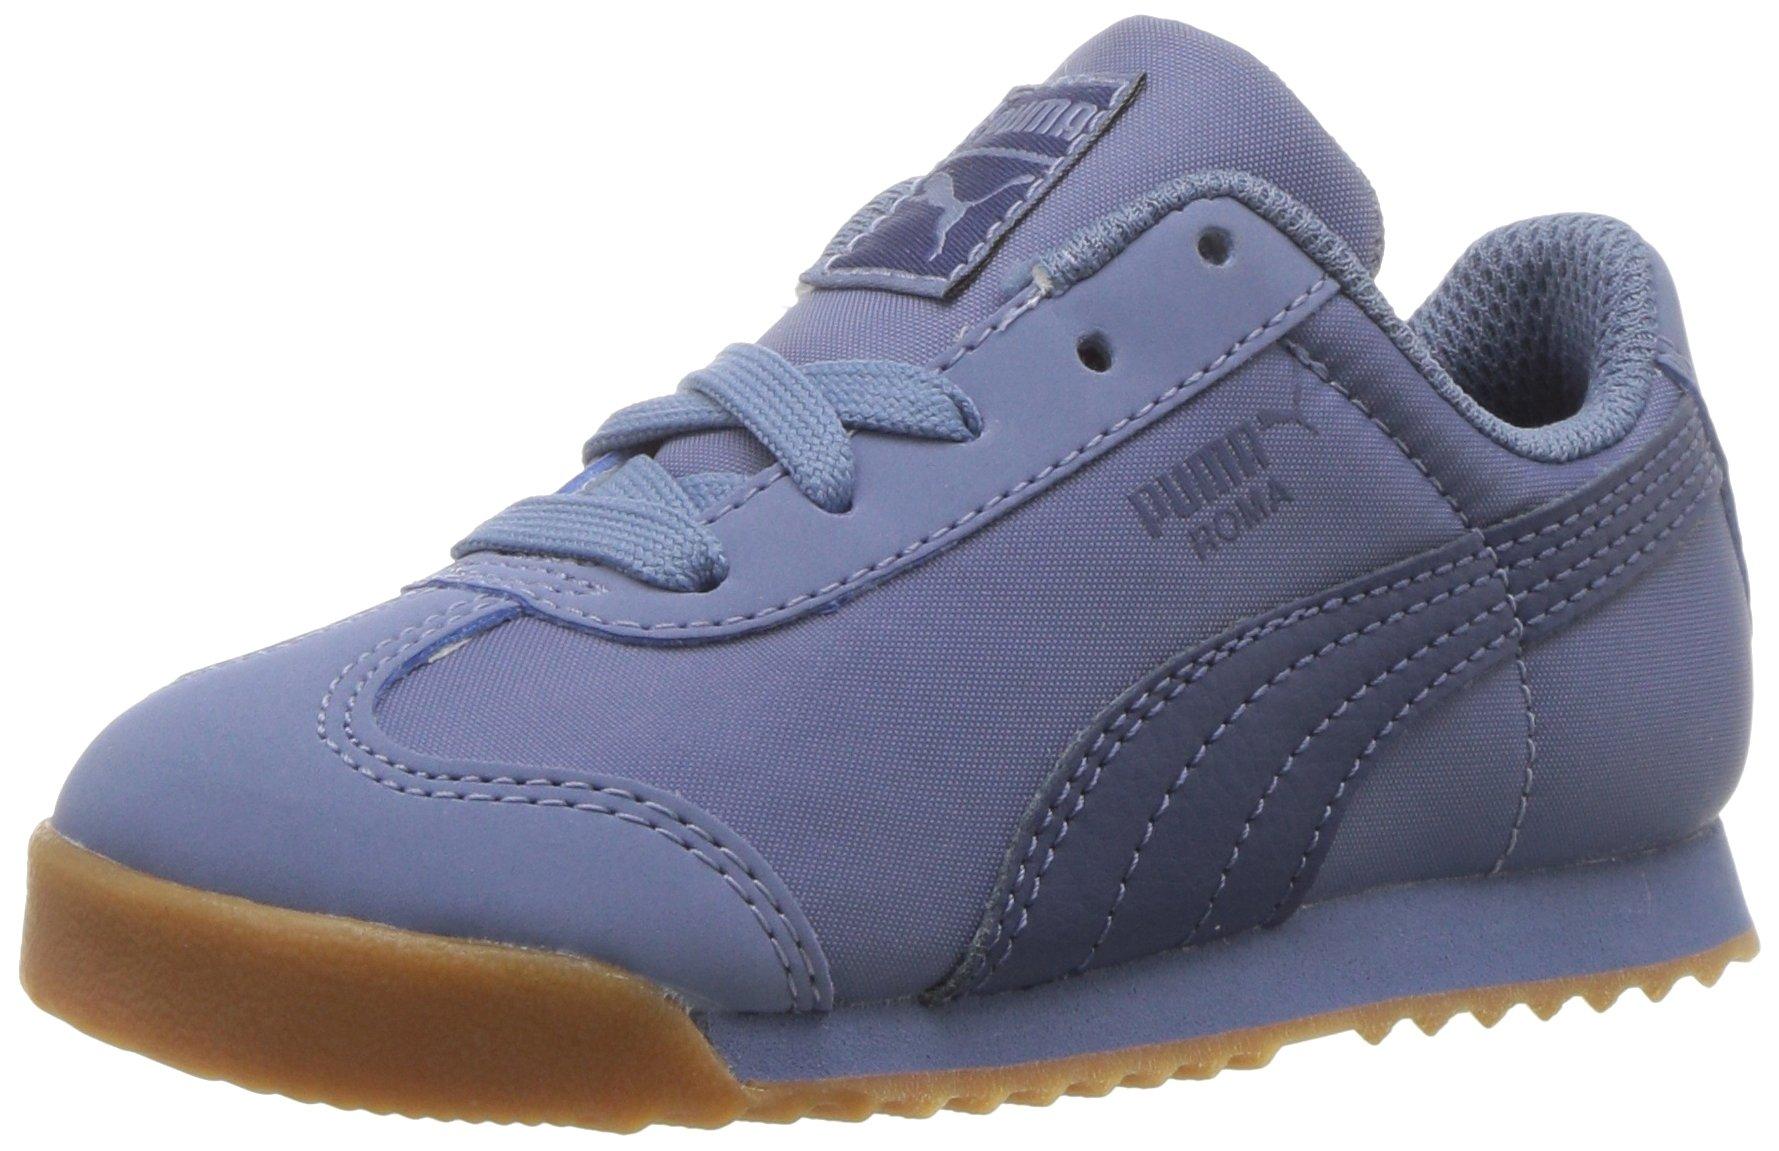 PUMA Unisex-Kids Roma Basic Summer Sneaker, Infinity-Blue Indigo, 13 M US Little Kid